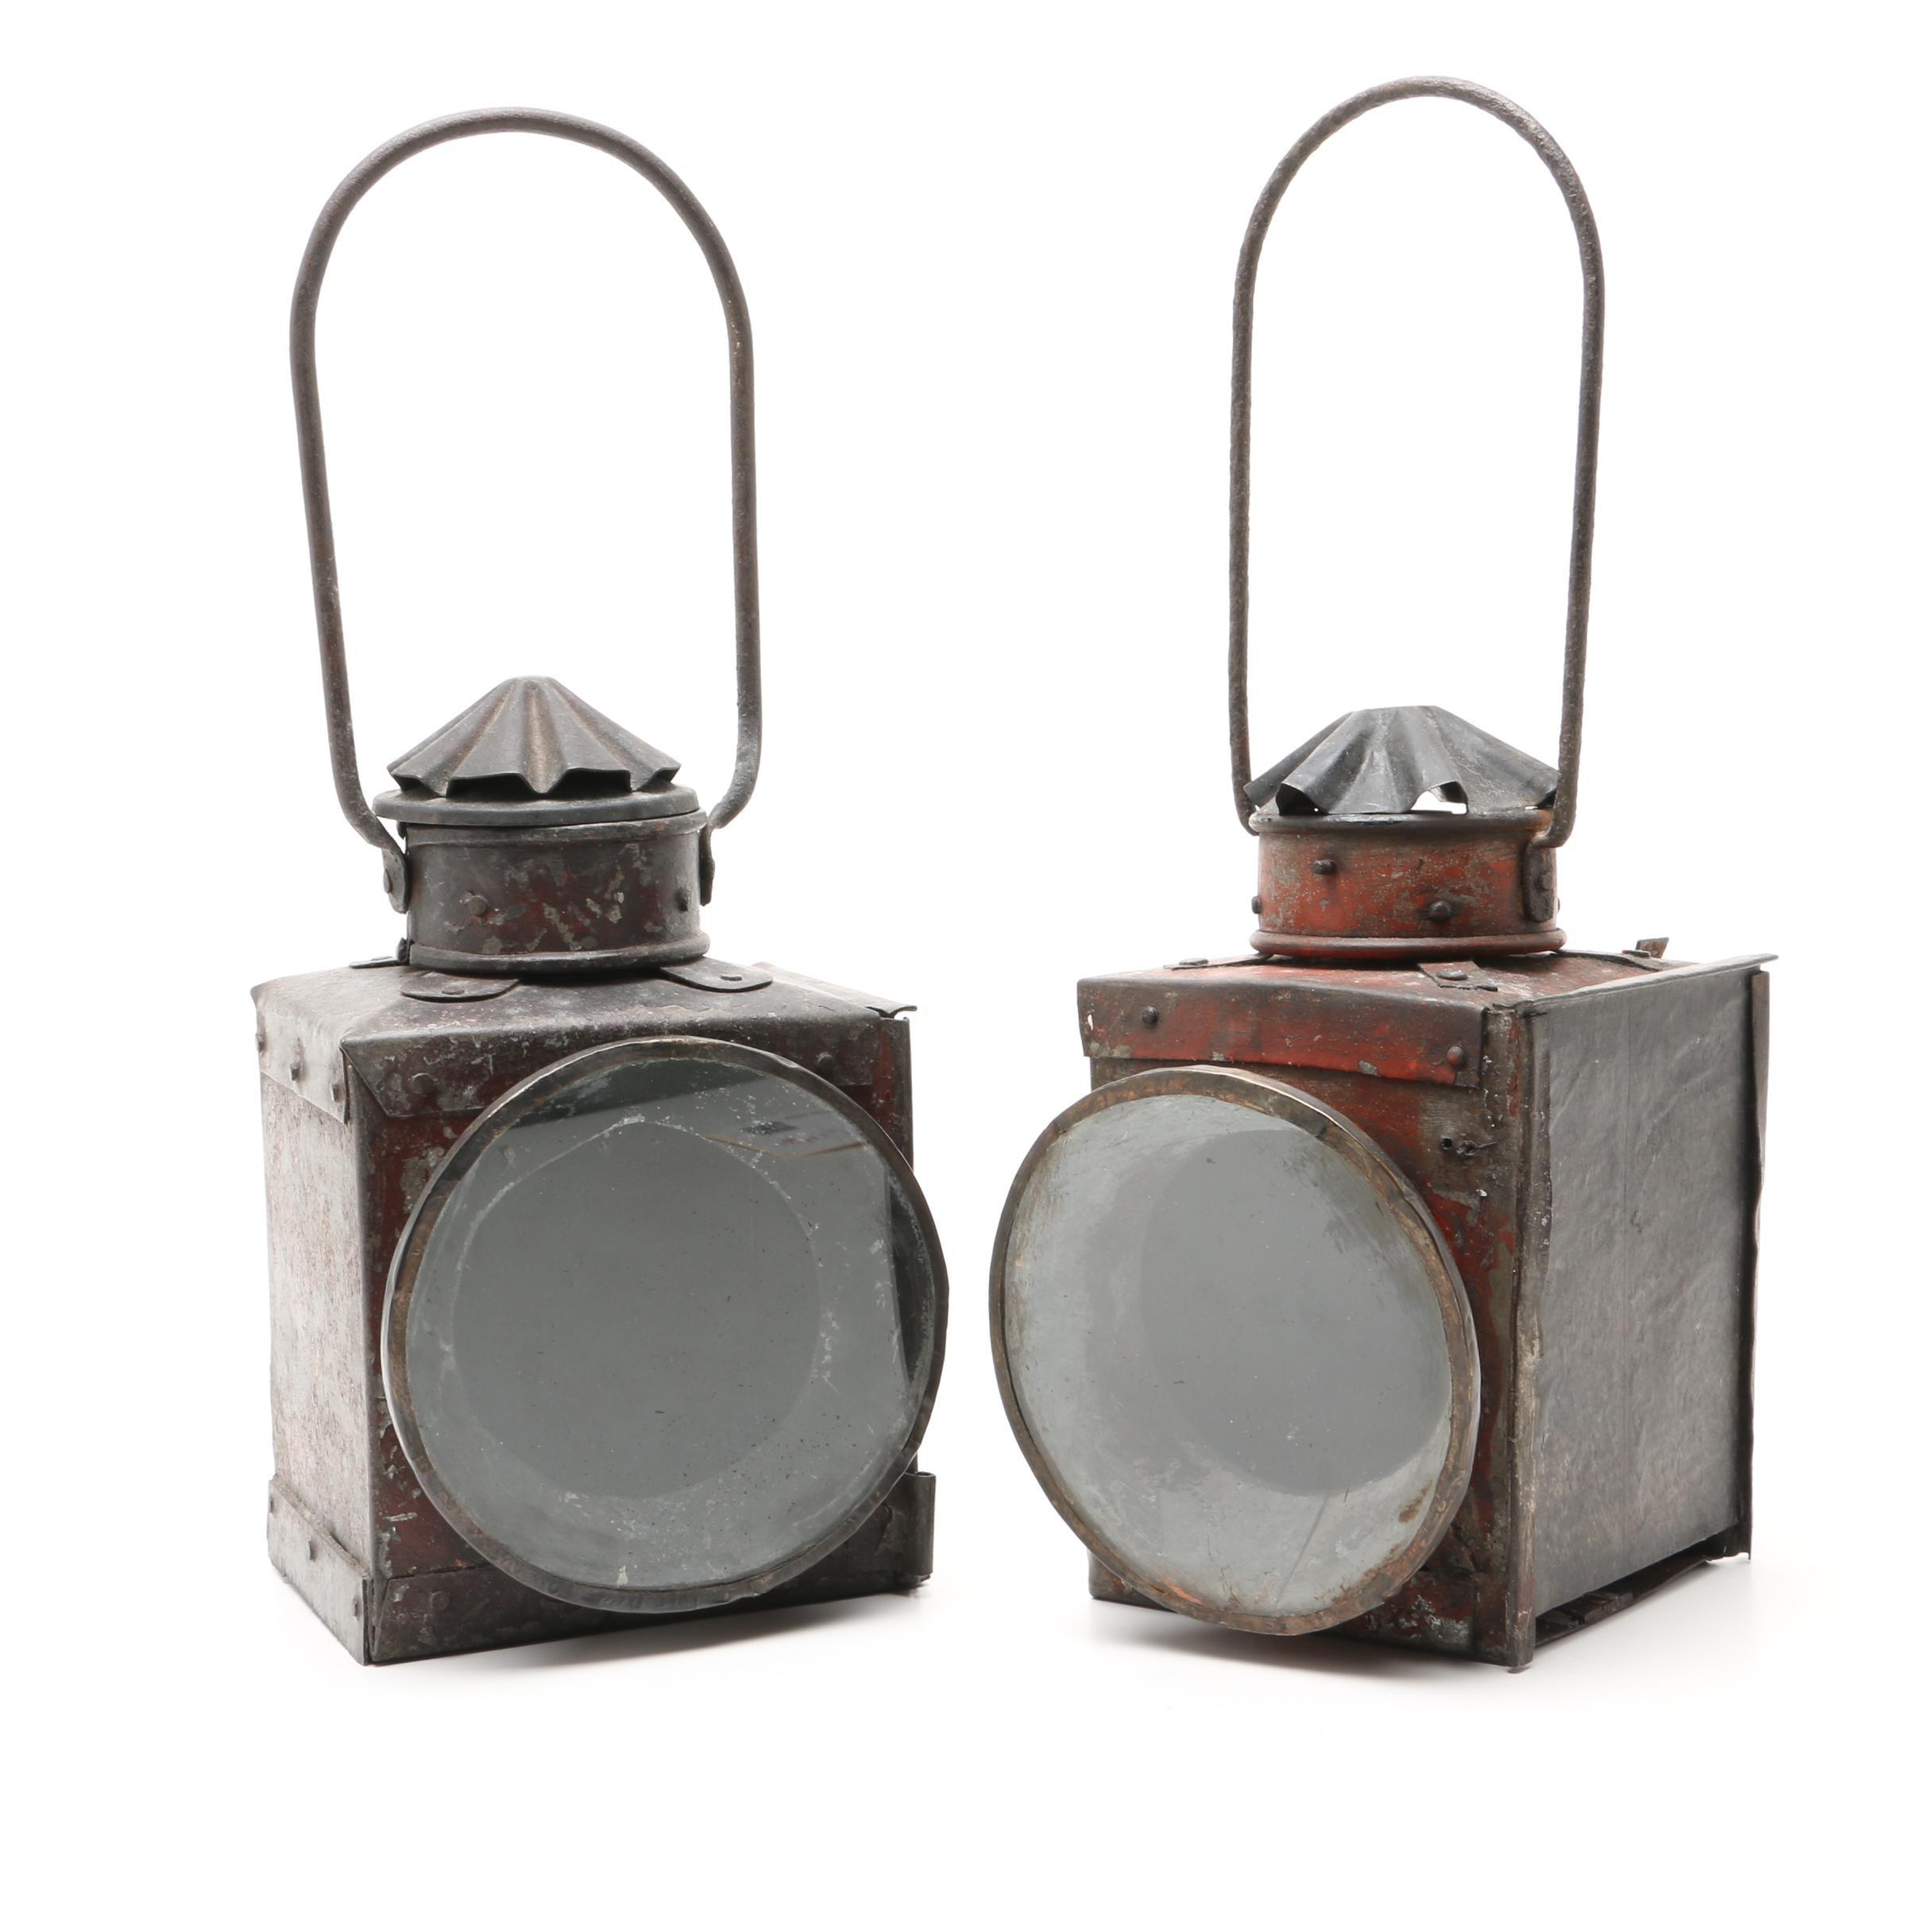 Antique Carriage Lanterns